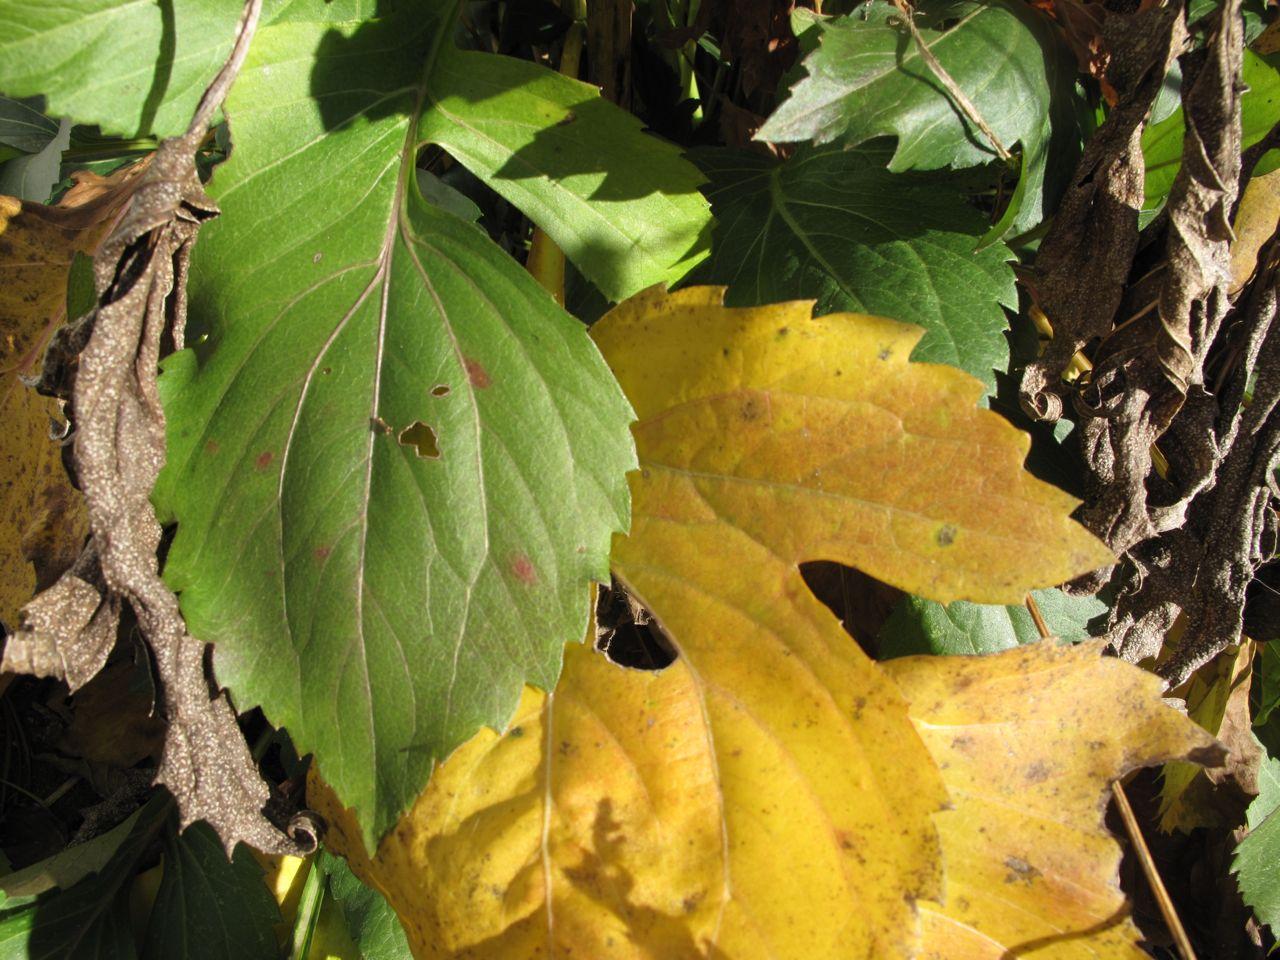 Leaves of Rudbeckia hirta 'Irish Eyes'